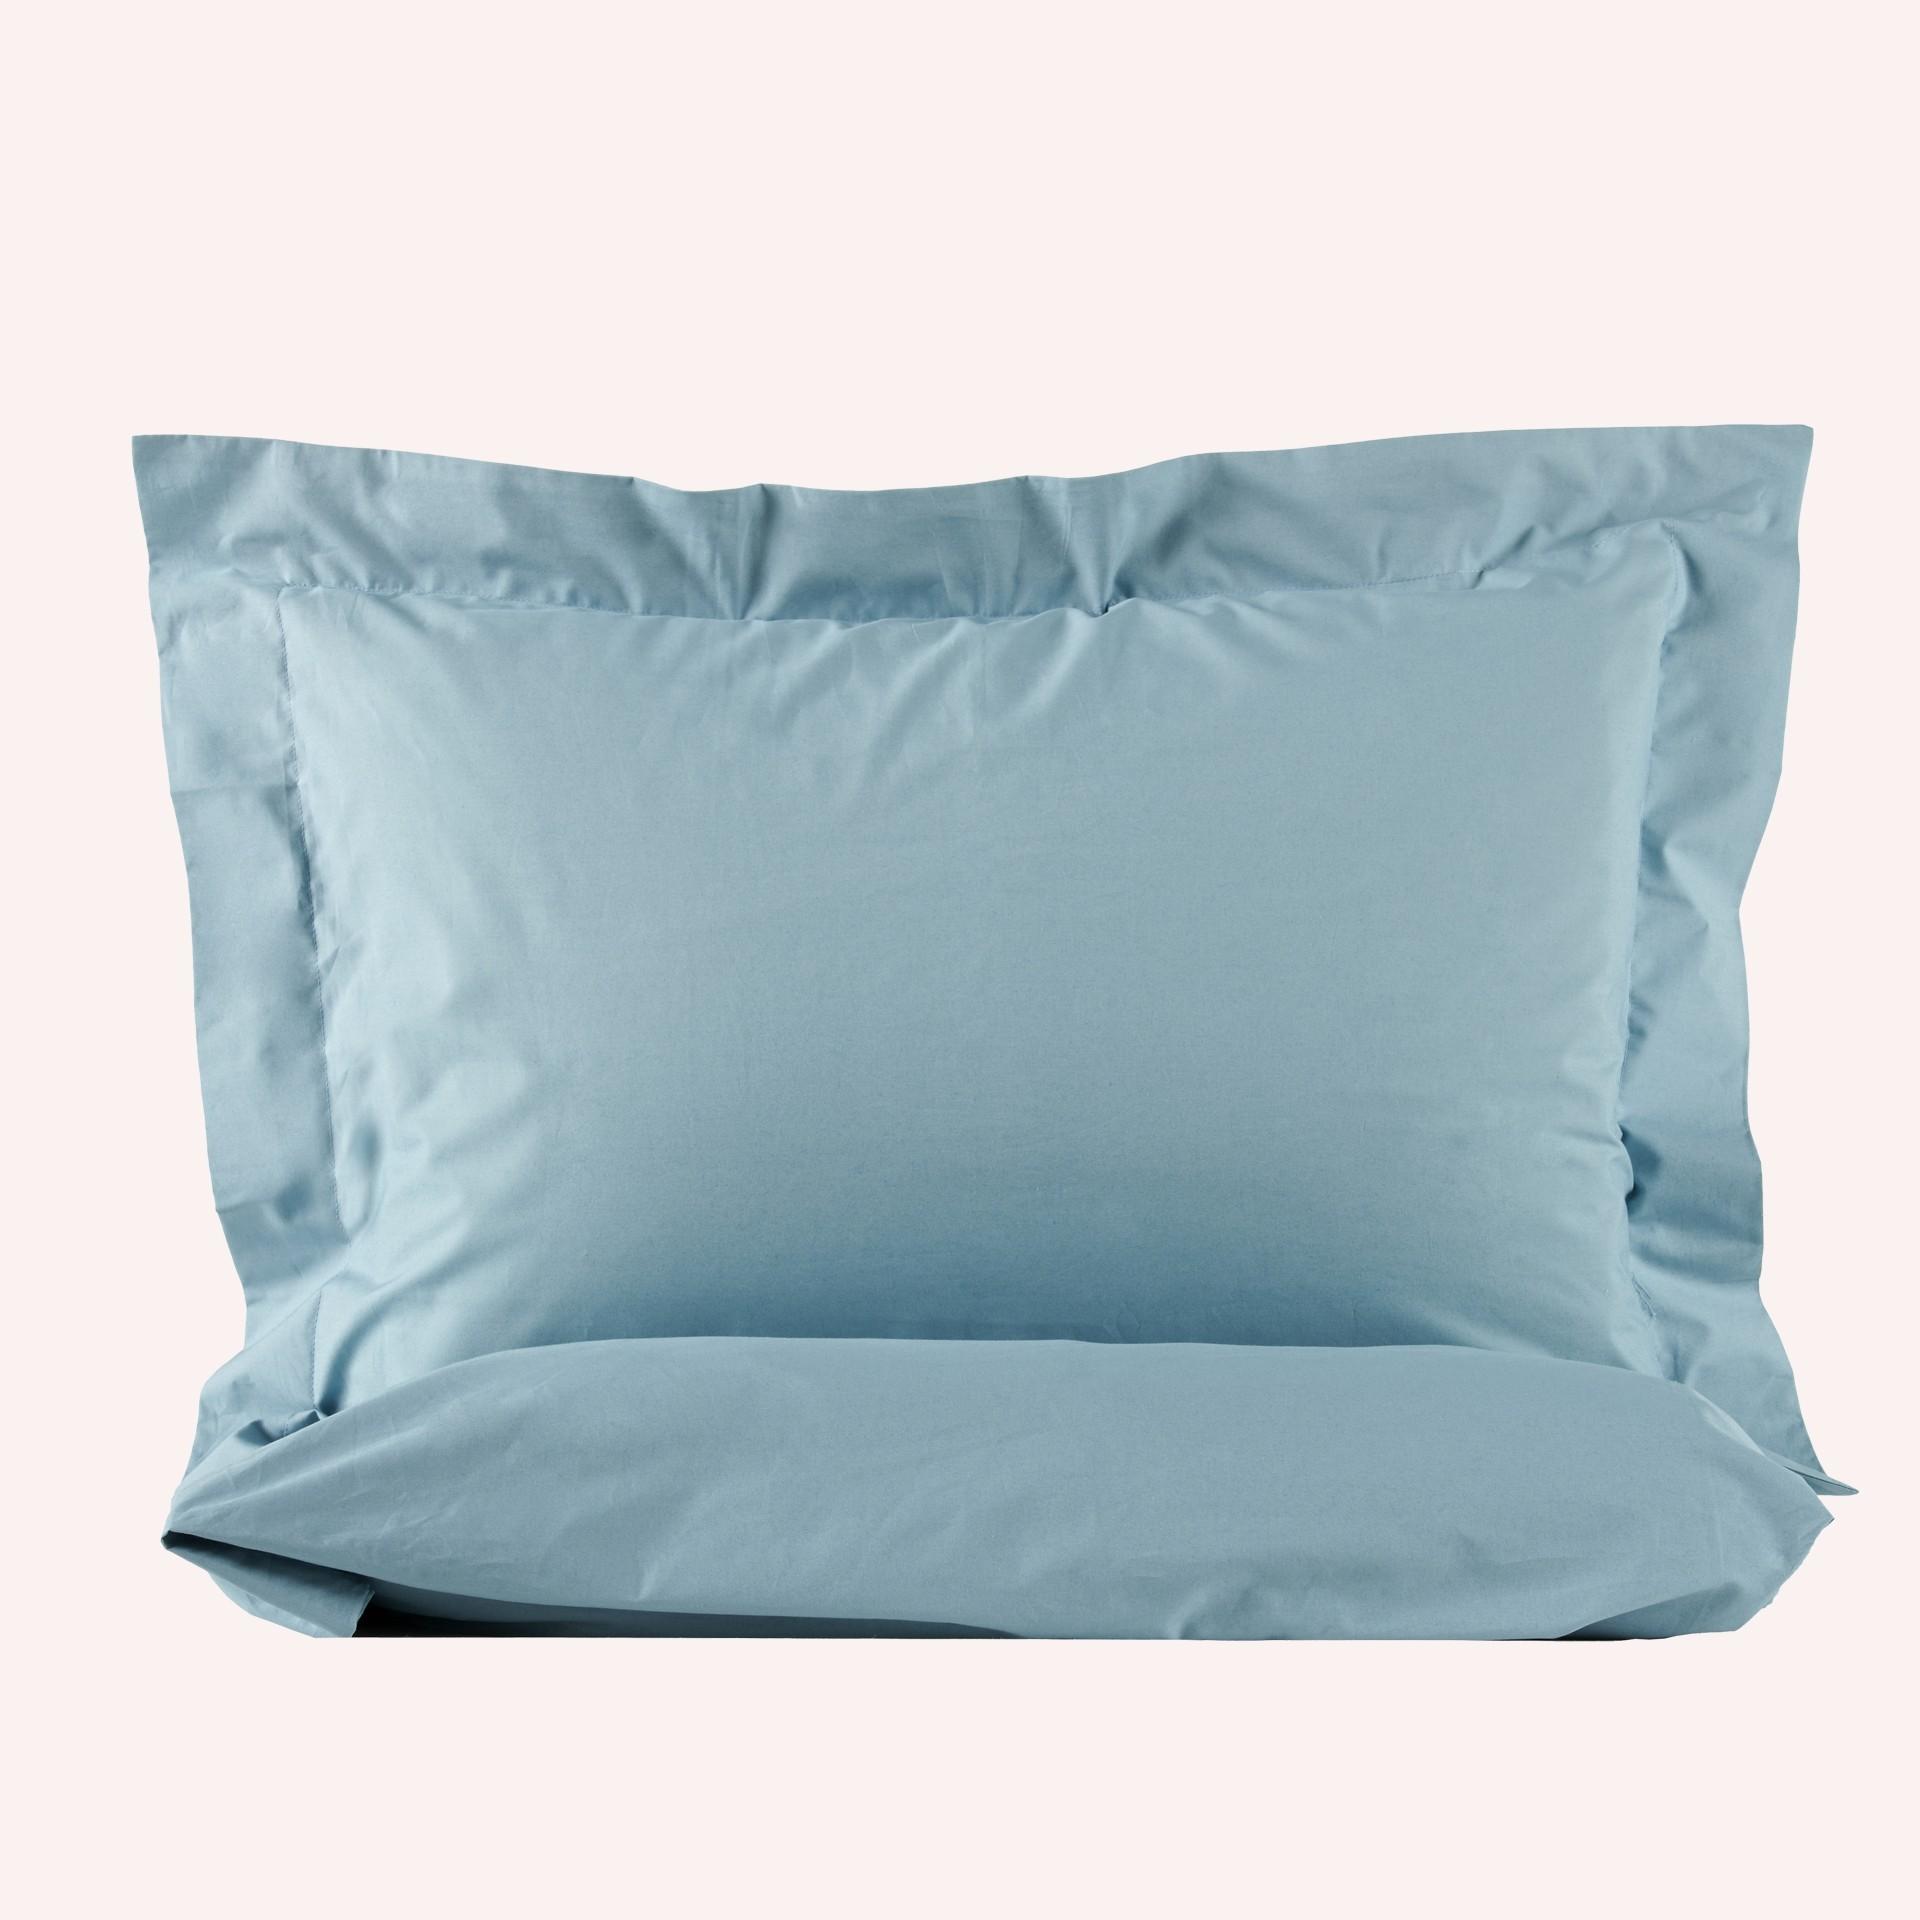 coco mat organic bedding